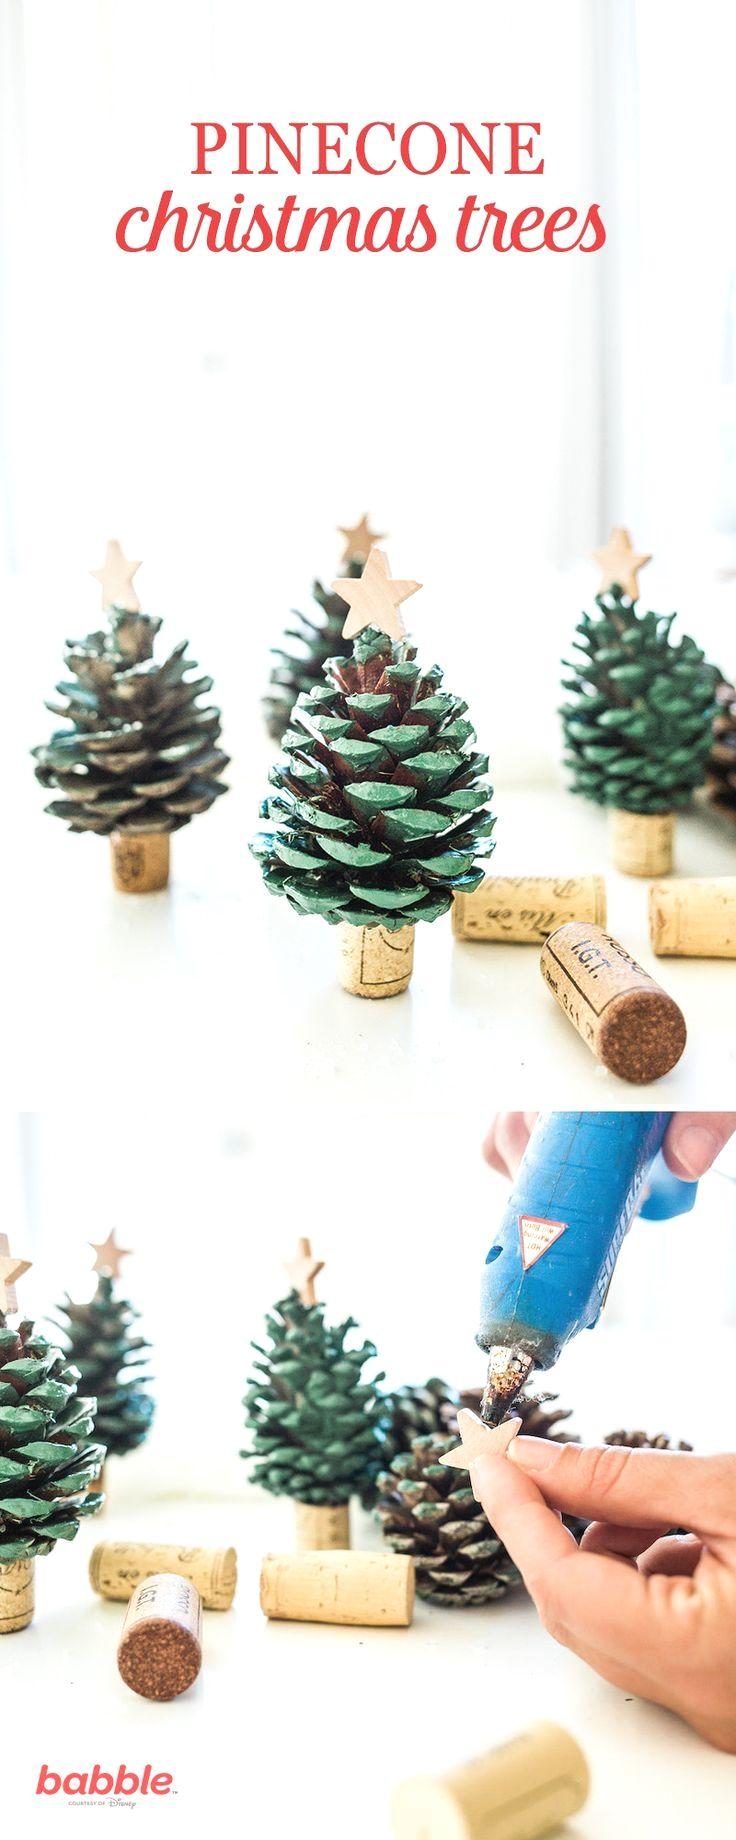 11 Last Minute Crafty Christmas Diy Ideas 1 Diy Christmas